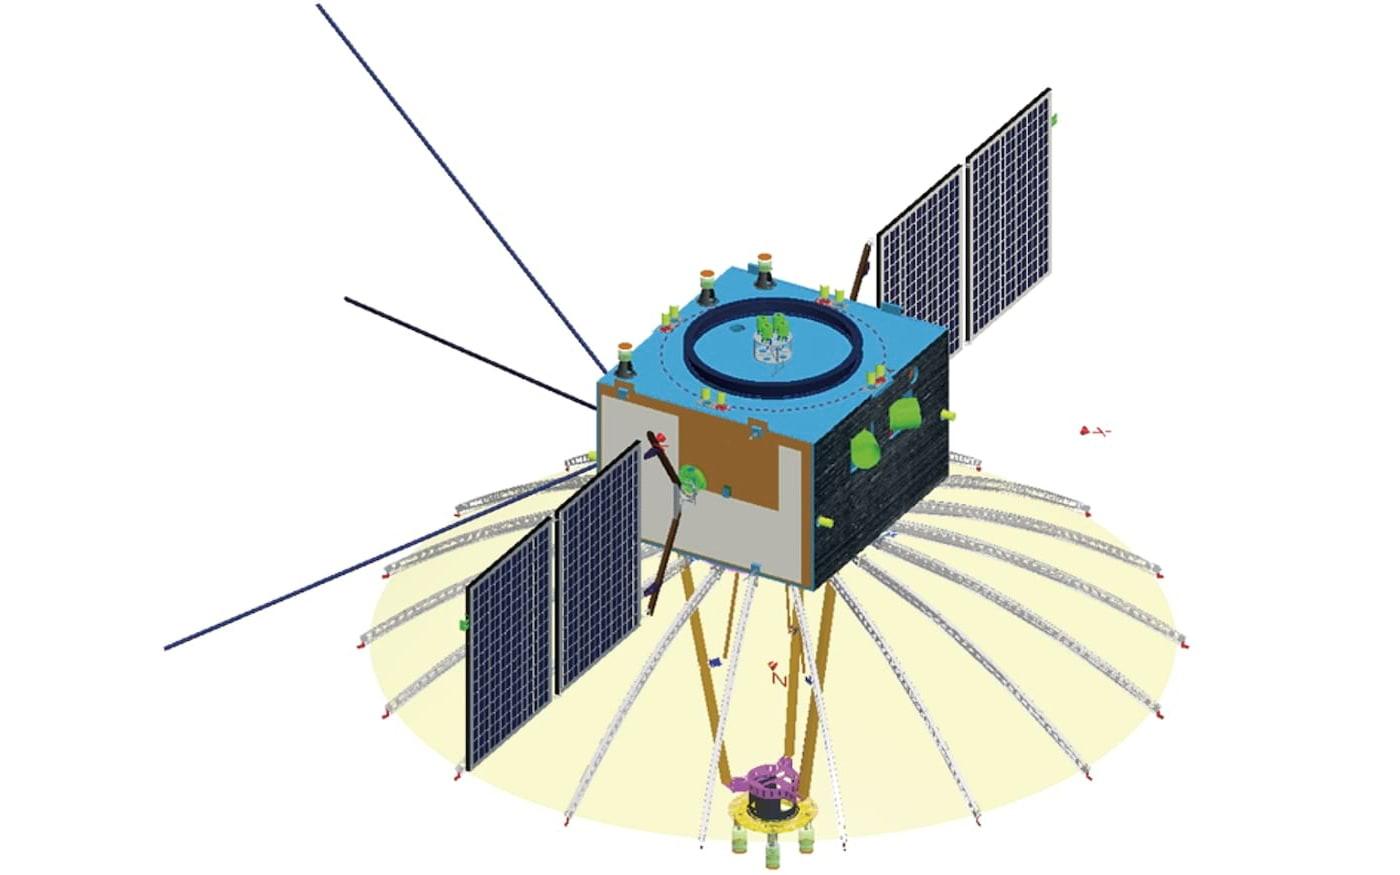 Ilustração do NLCE - Chinese Aerospace Science and Technology Corp.